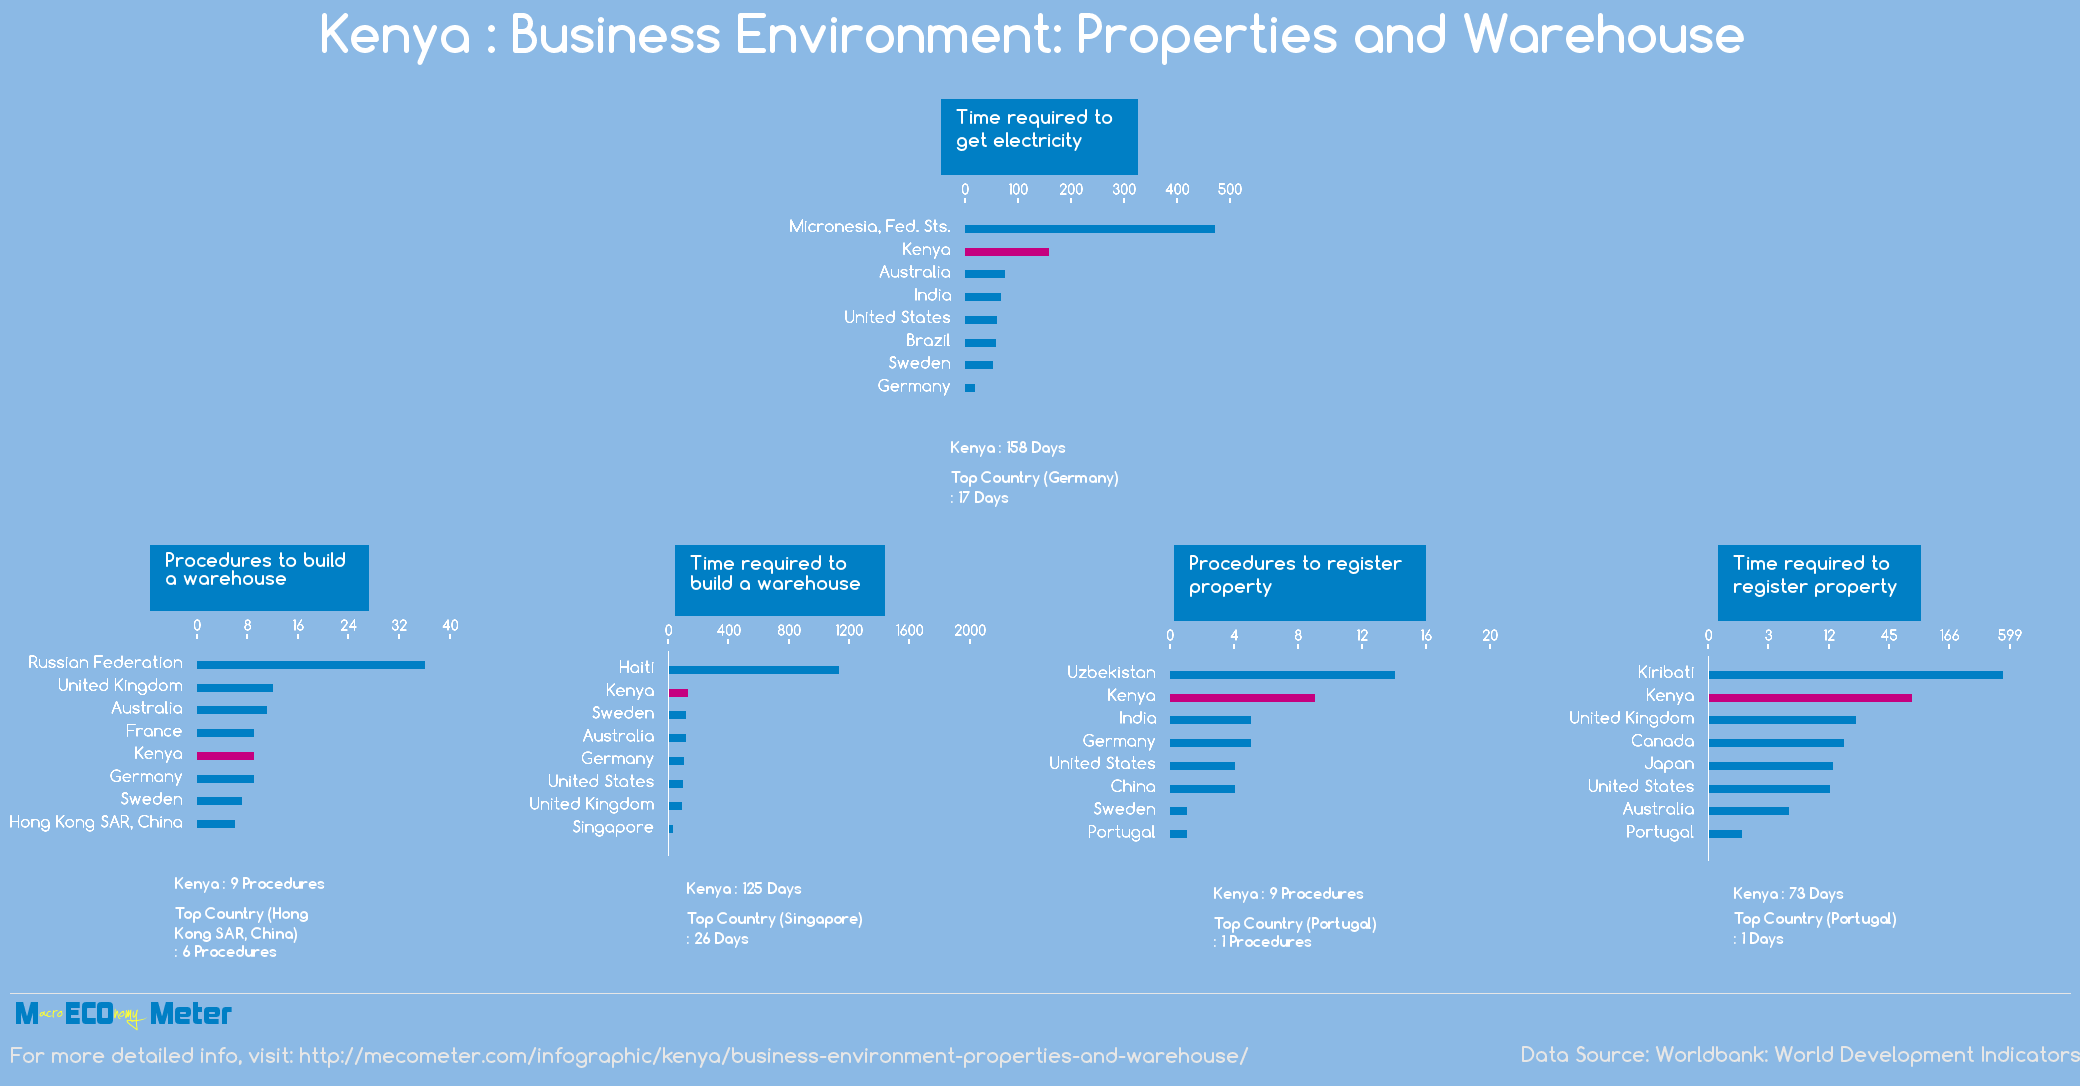 Kenya : Business Environment: Properties and Warehouse